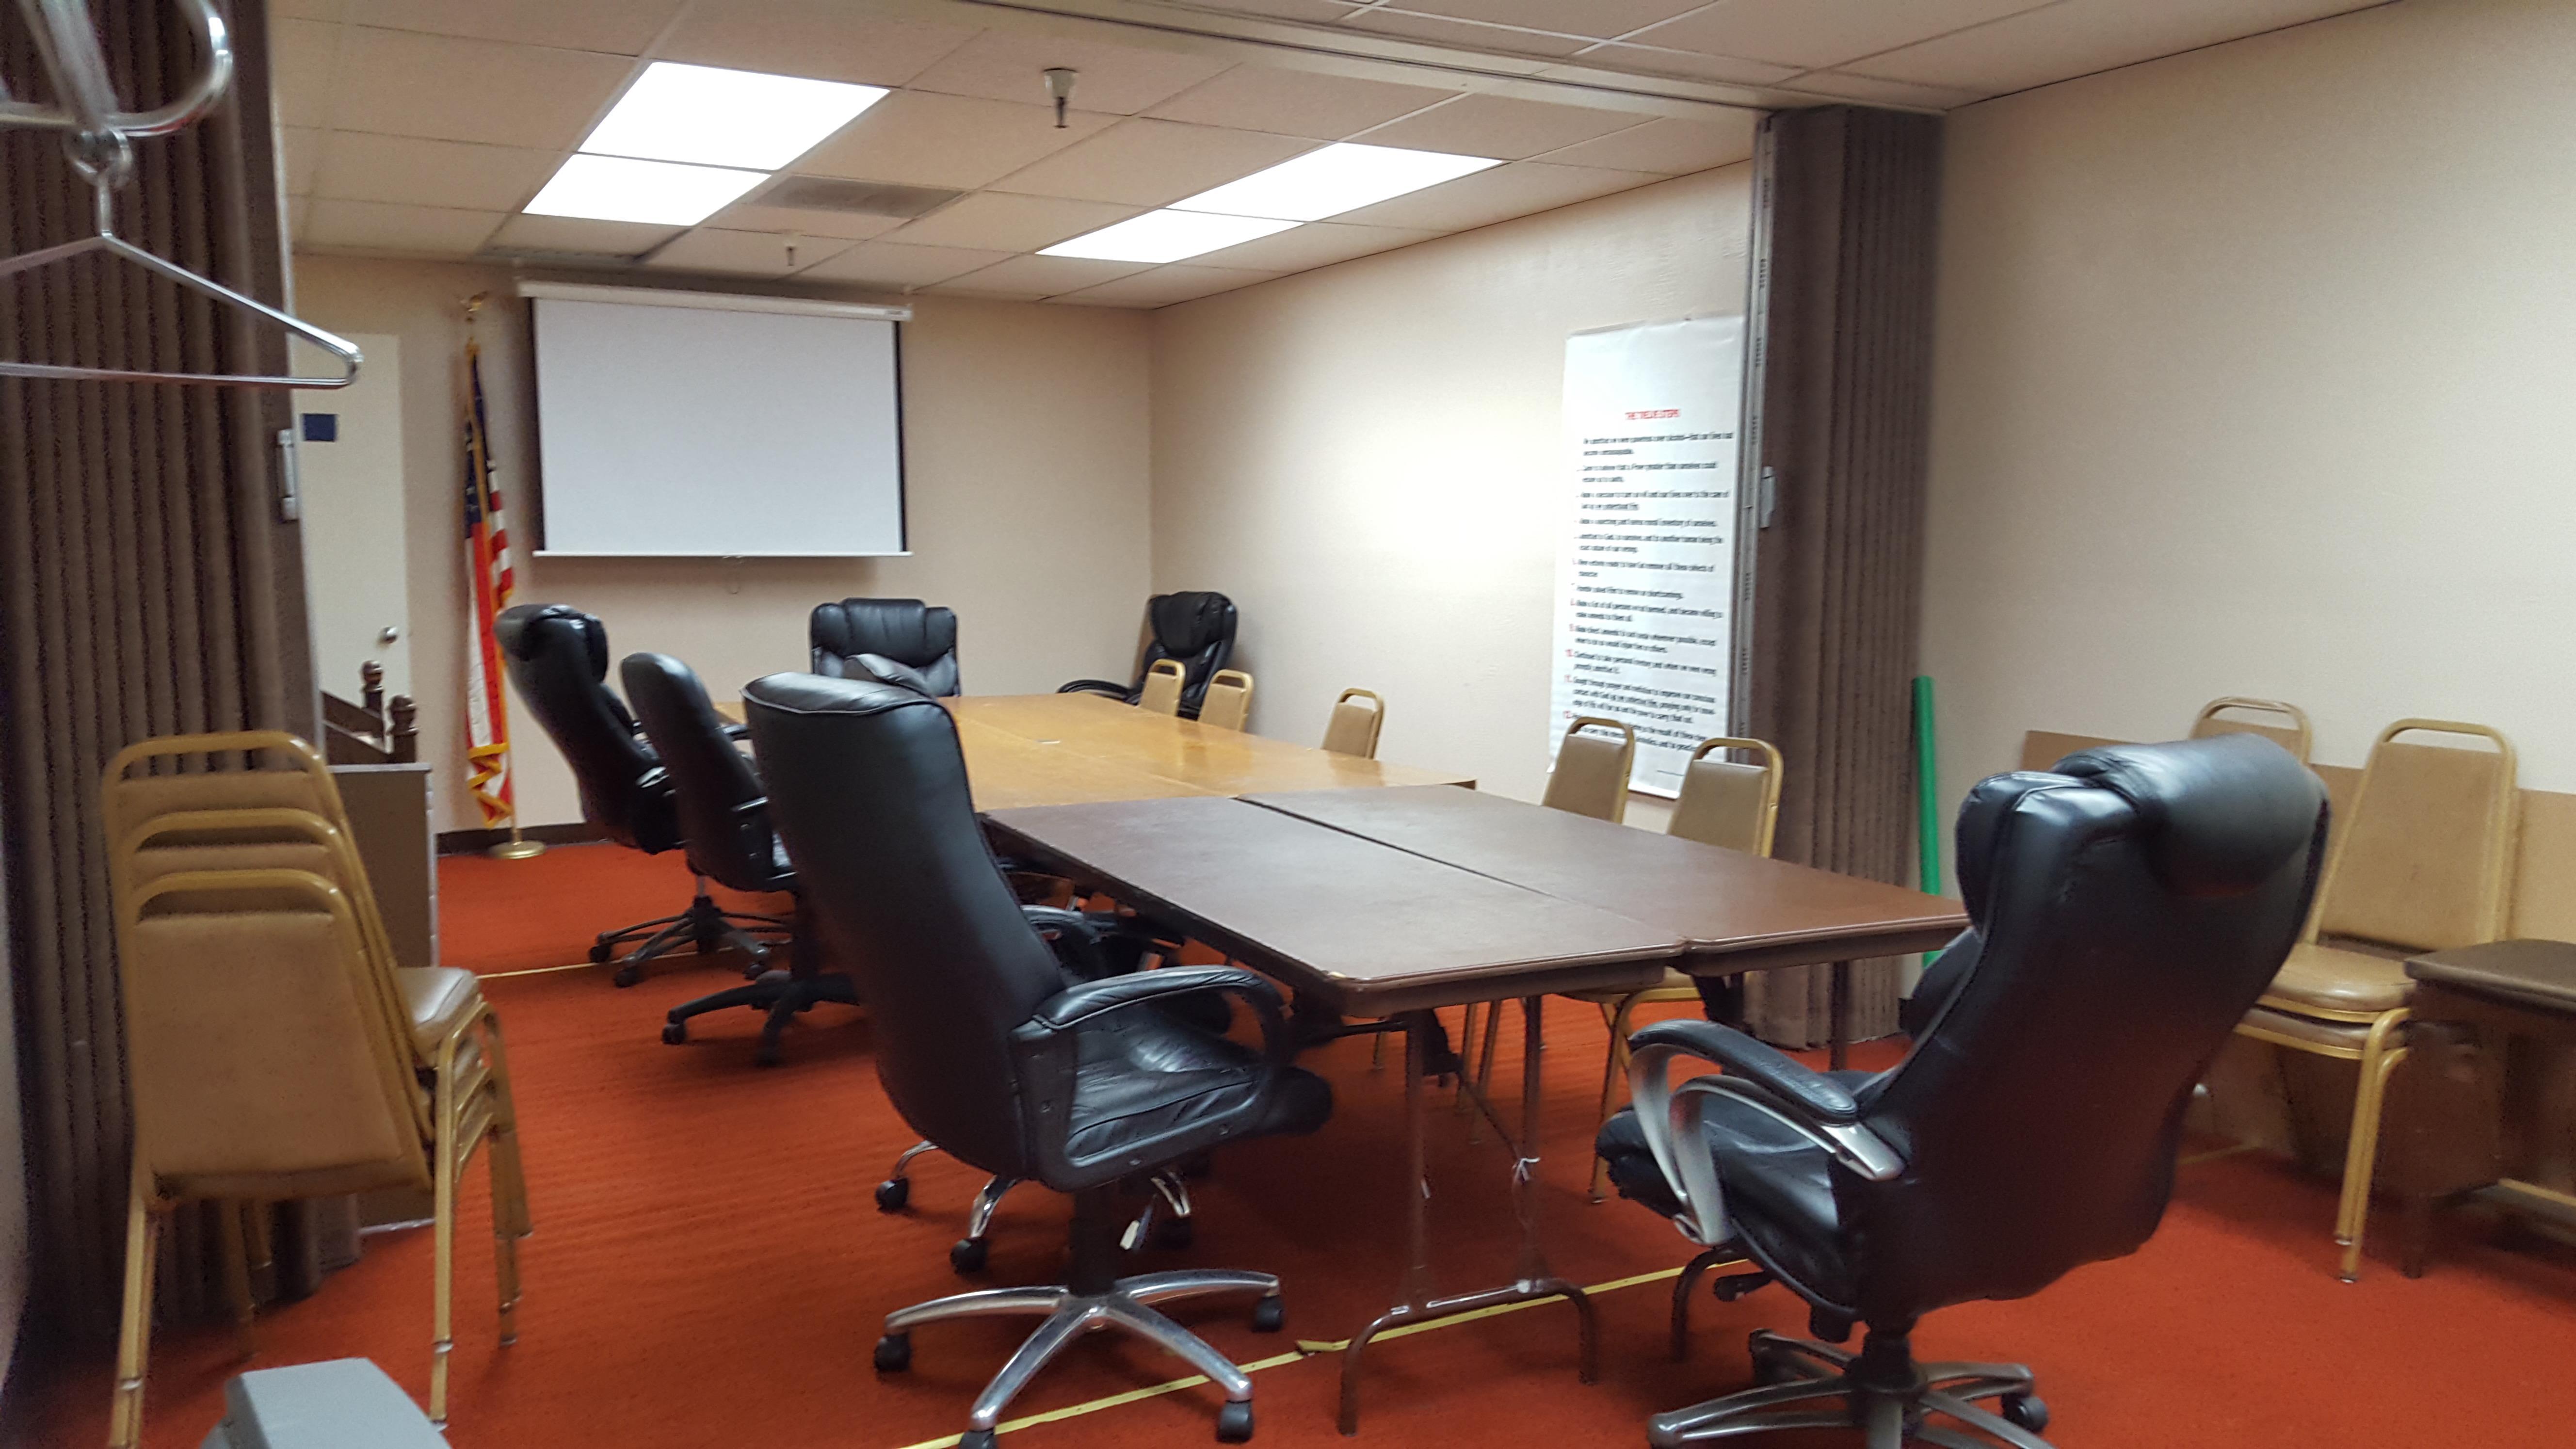 San Jose Masonic Center - Library/Conference Room